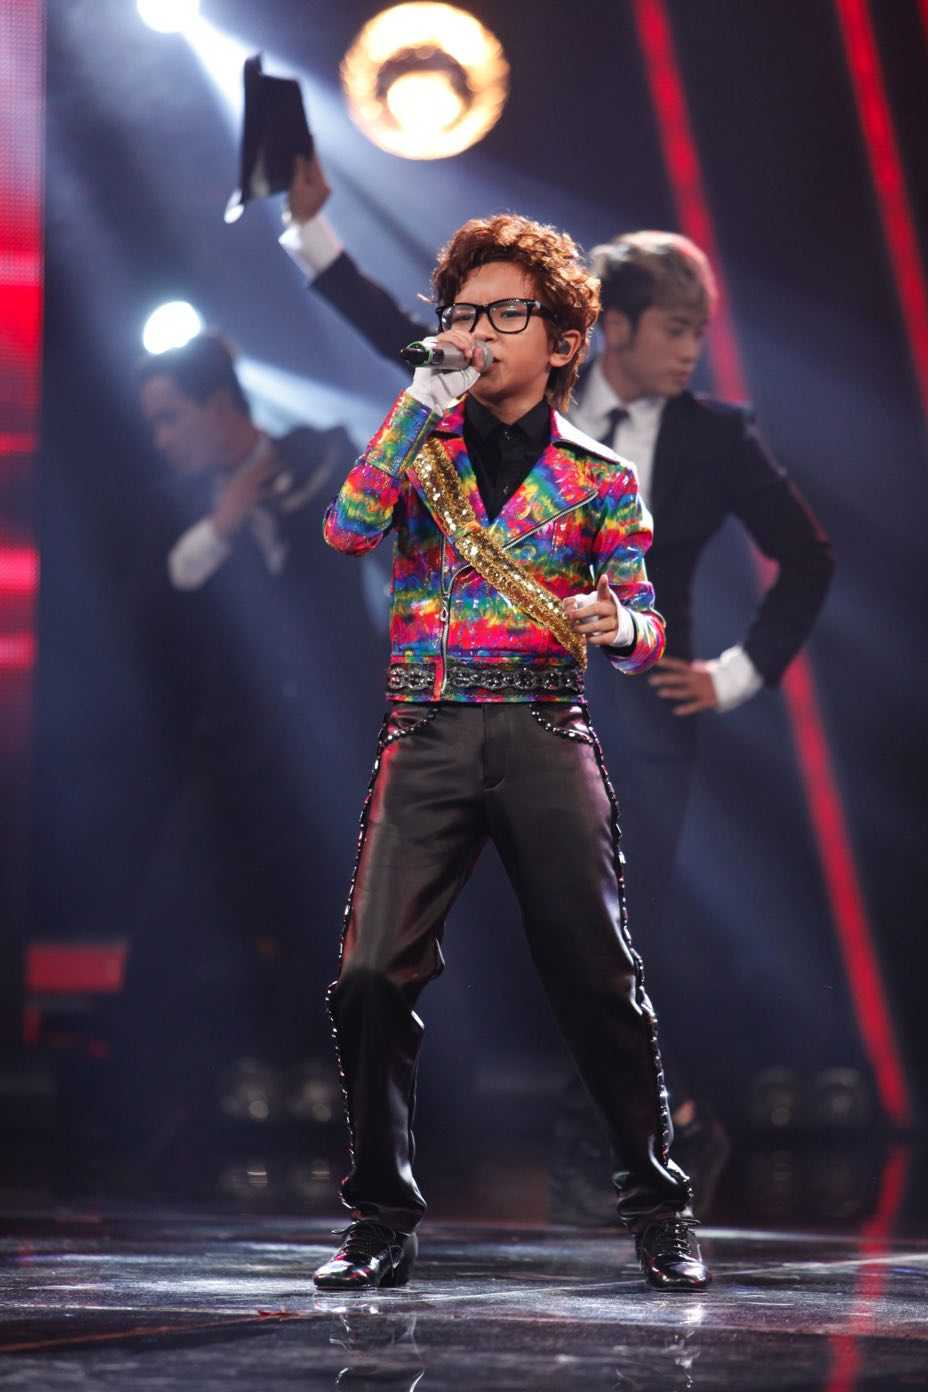 Truc tiep liveshow 4 Vietnam Idol Kids: Ho Van Cuong duoc ca ba giam khao thach do hinh anh 2